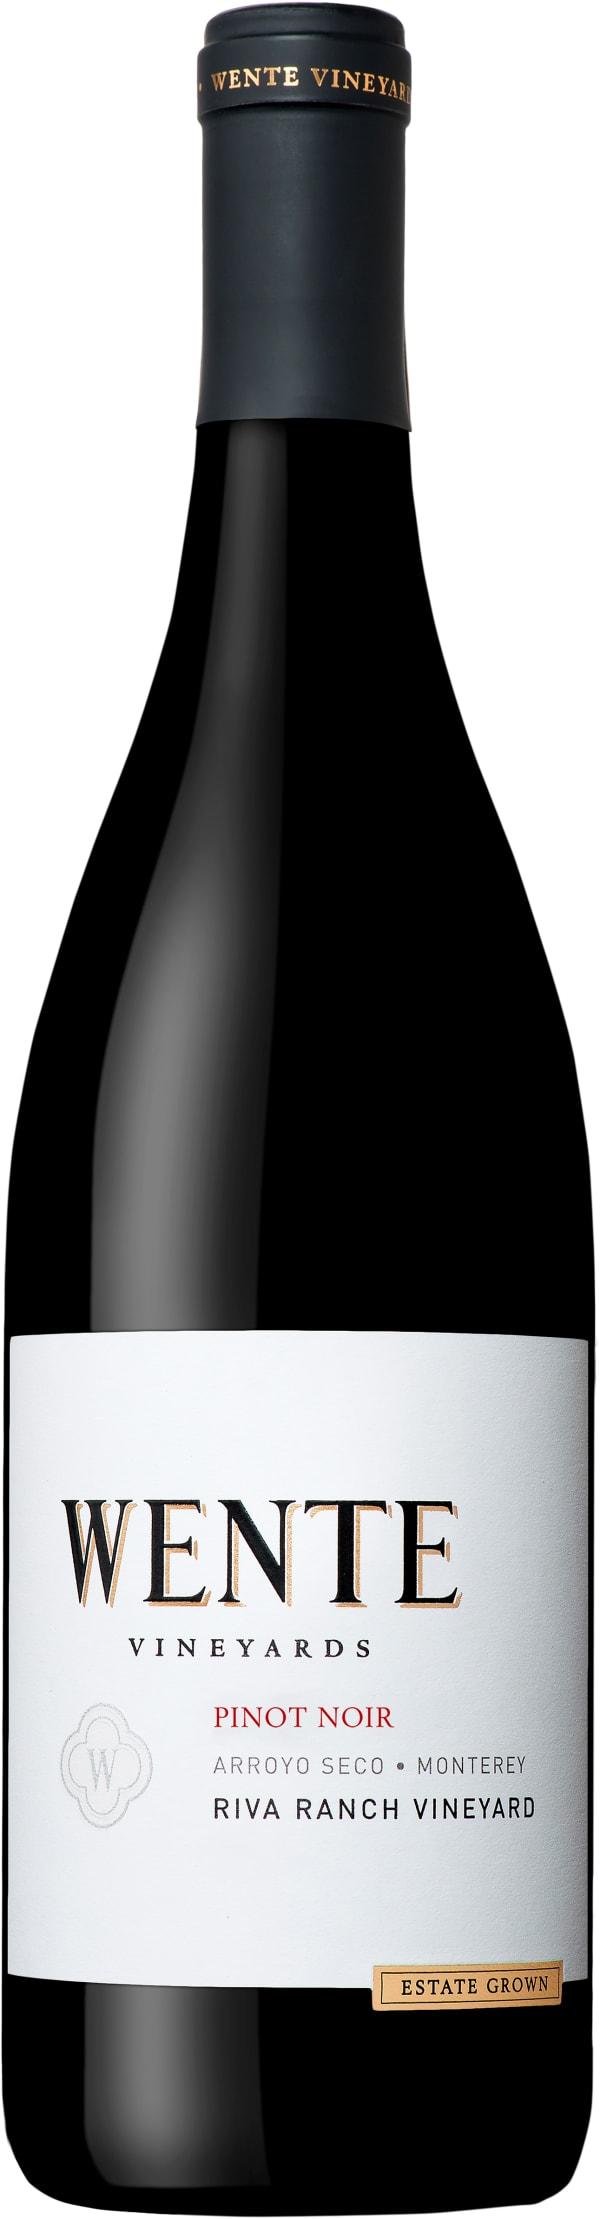 Wente Riva Ranch Pinot Noir 2018